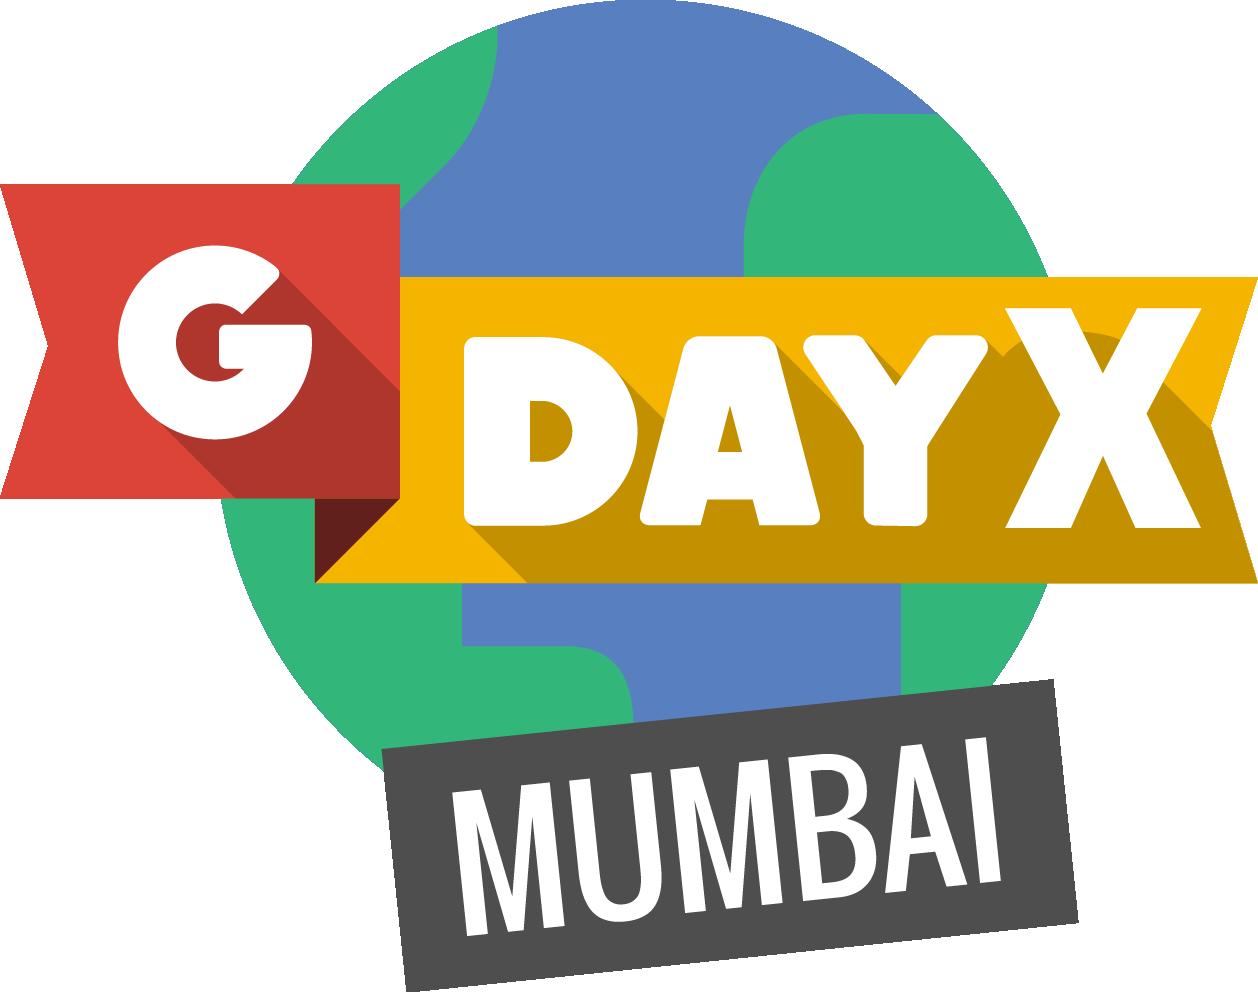 Google Day X, Google Day